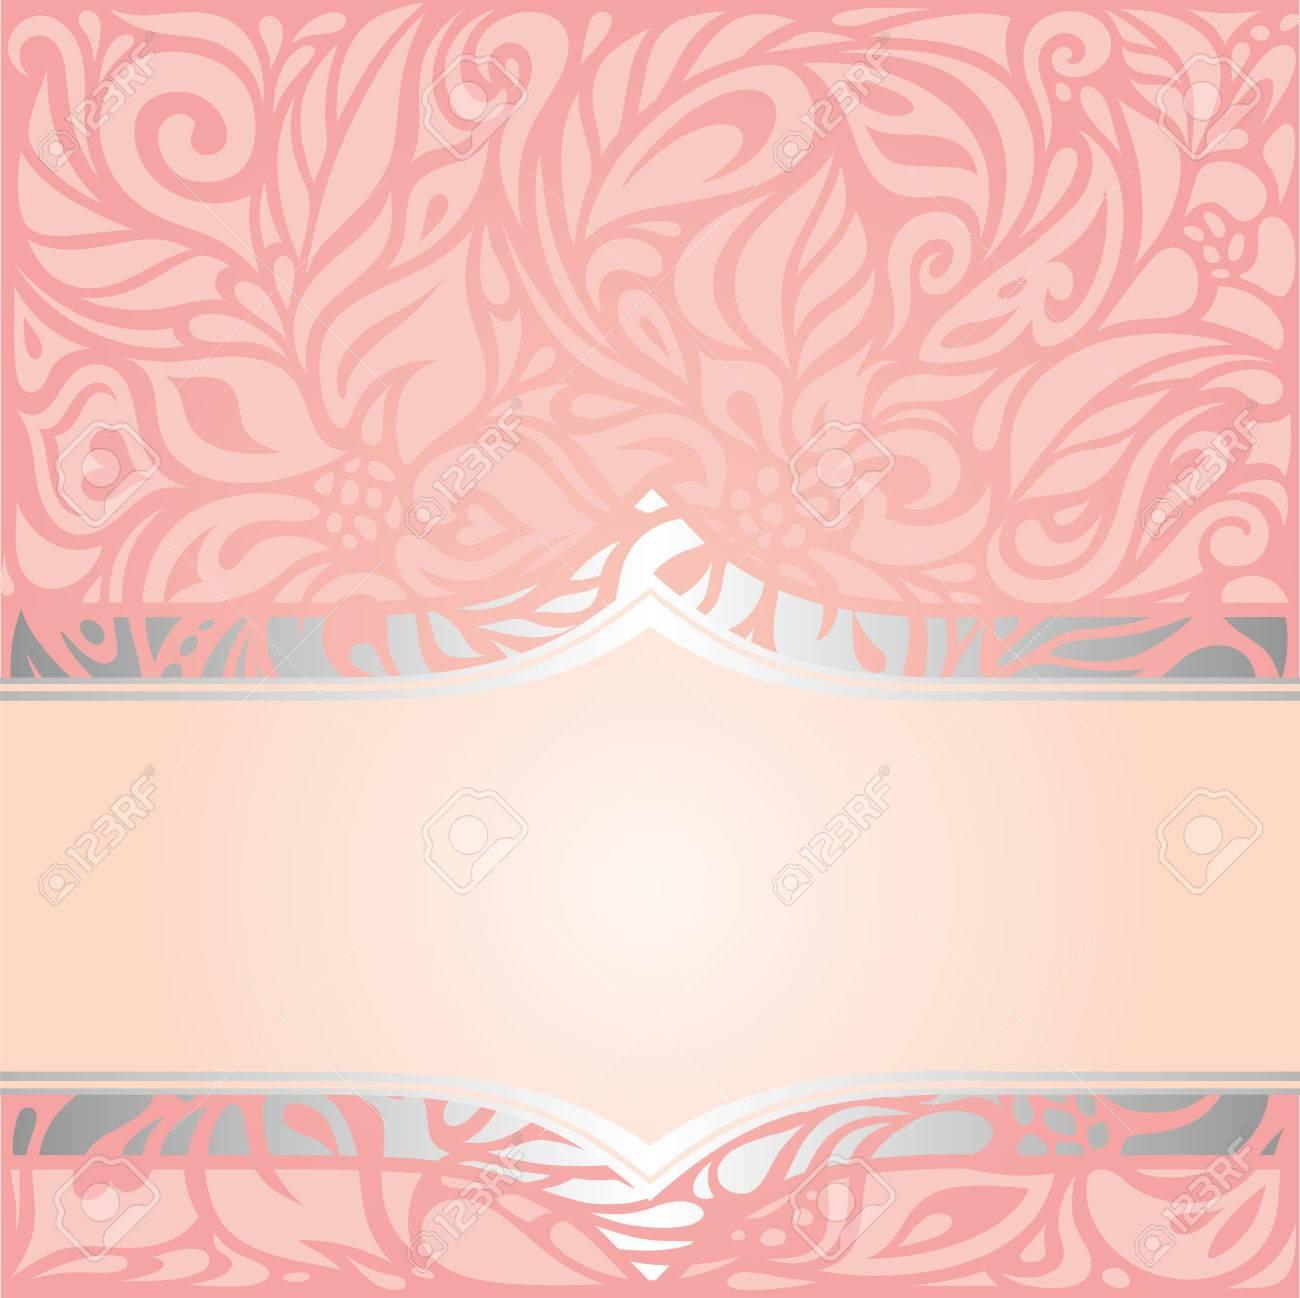 Pink Silver Retro Decorative Invitation Vintage Vector Wallpaper Design Stock